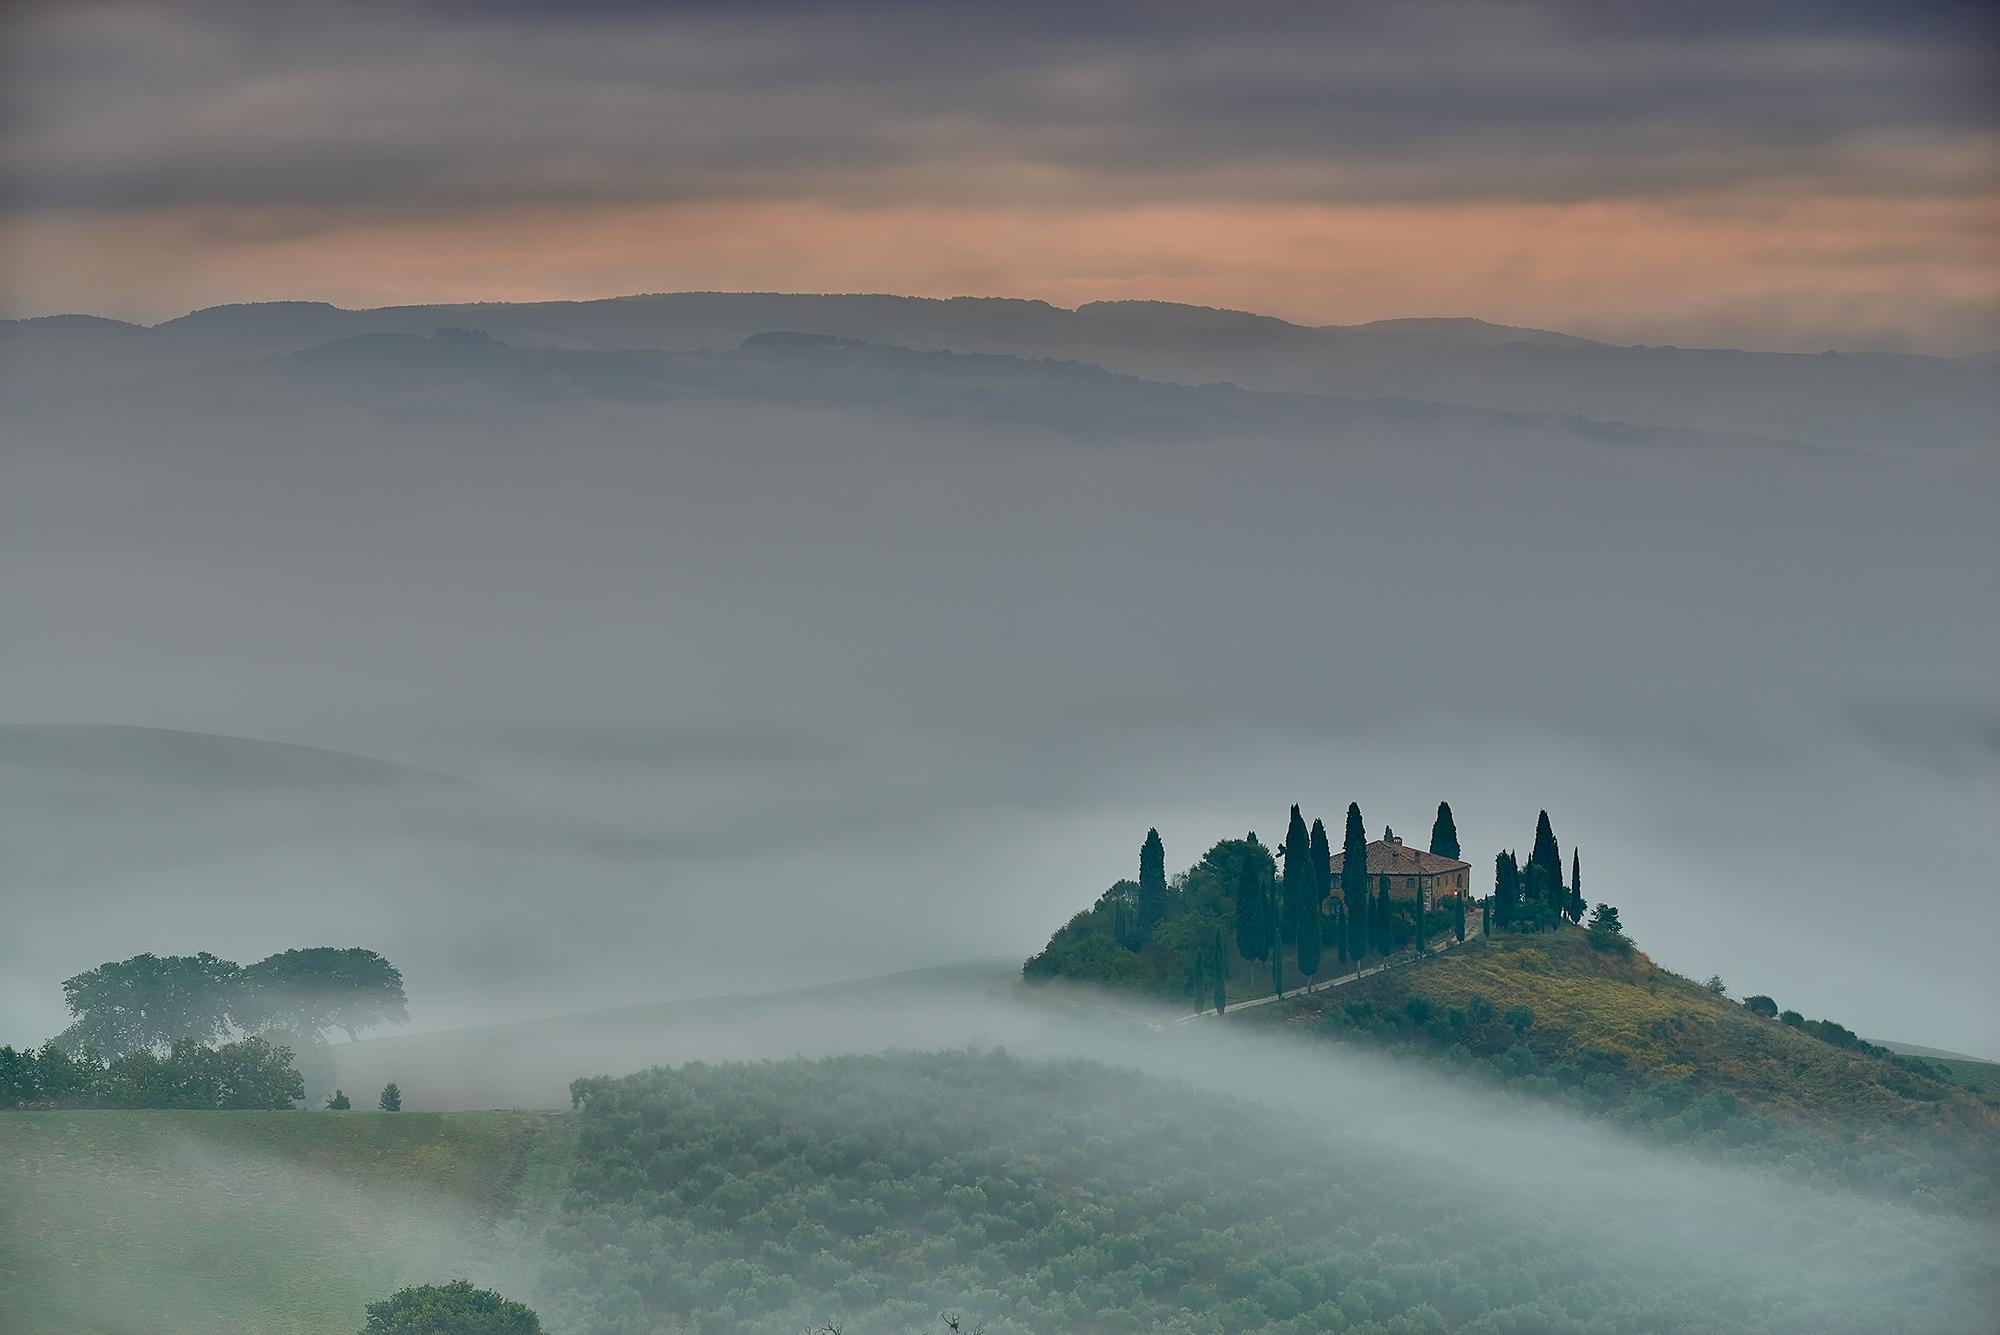 Podere Belvedere, Italy